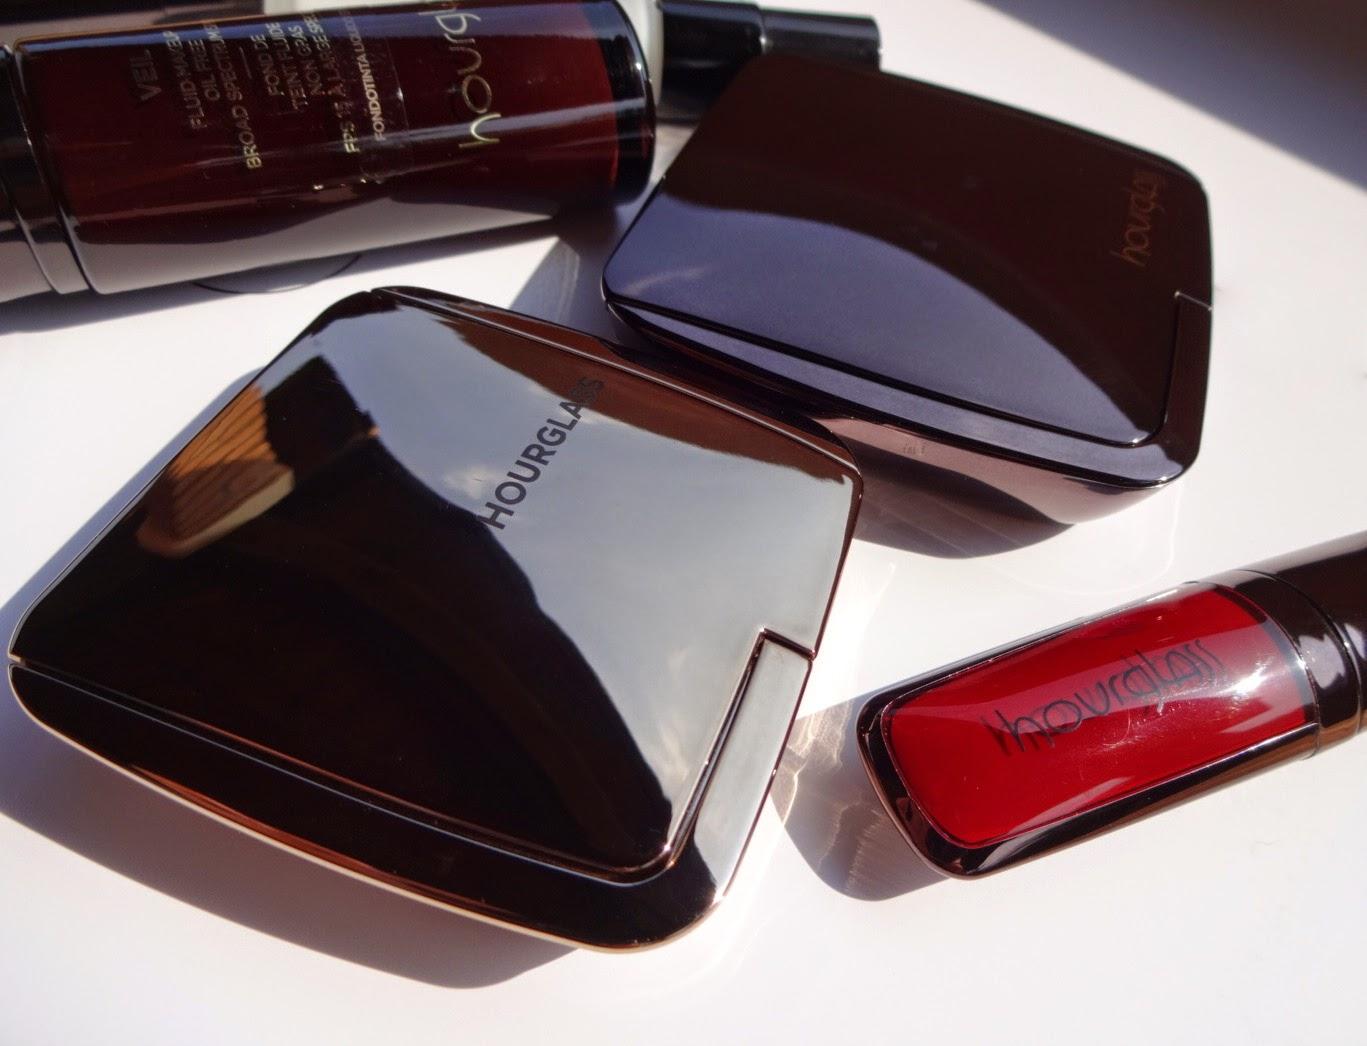 hourglass cosmetics italia, ambient lighting powder review recensione, hourglass ambient lighting blush, opaque rouge, veil fluid make up